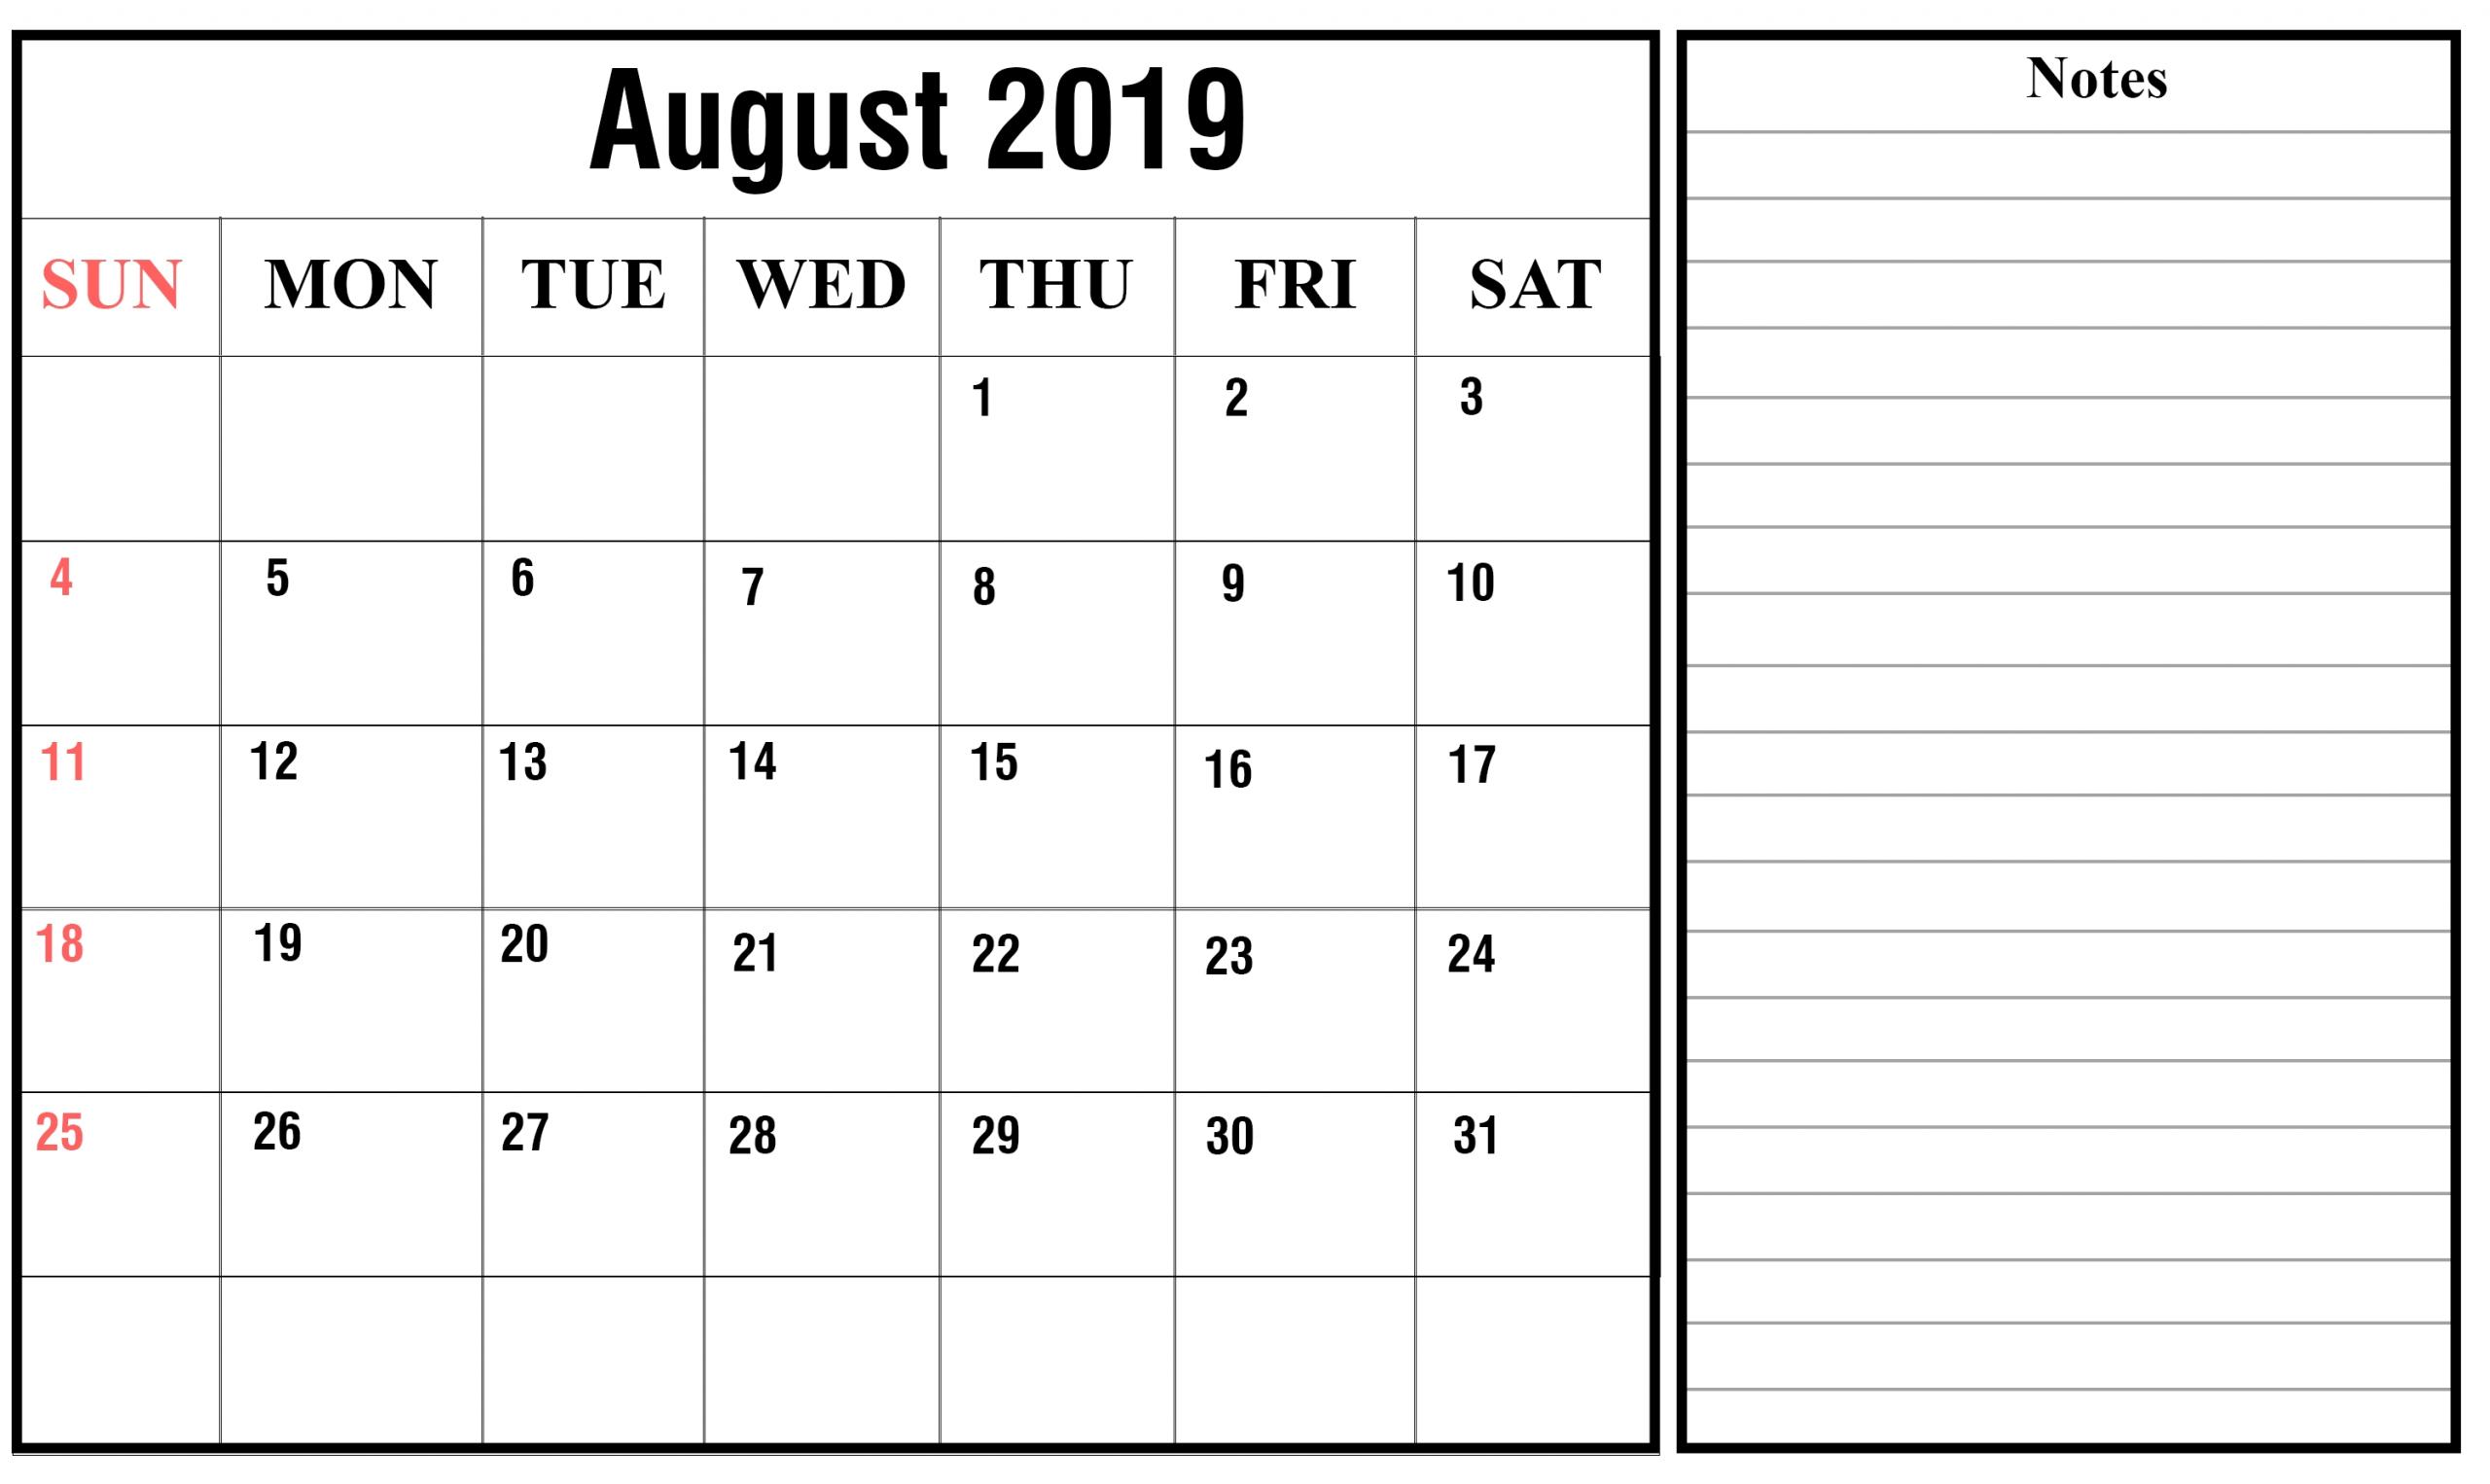 Free August 2019 Printable Calendar Templates {Pdf, Excel, Word}